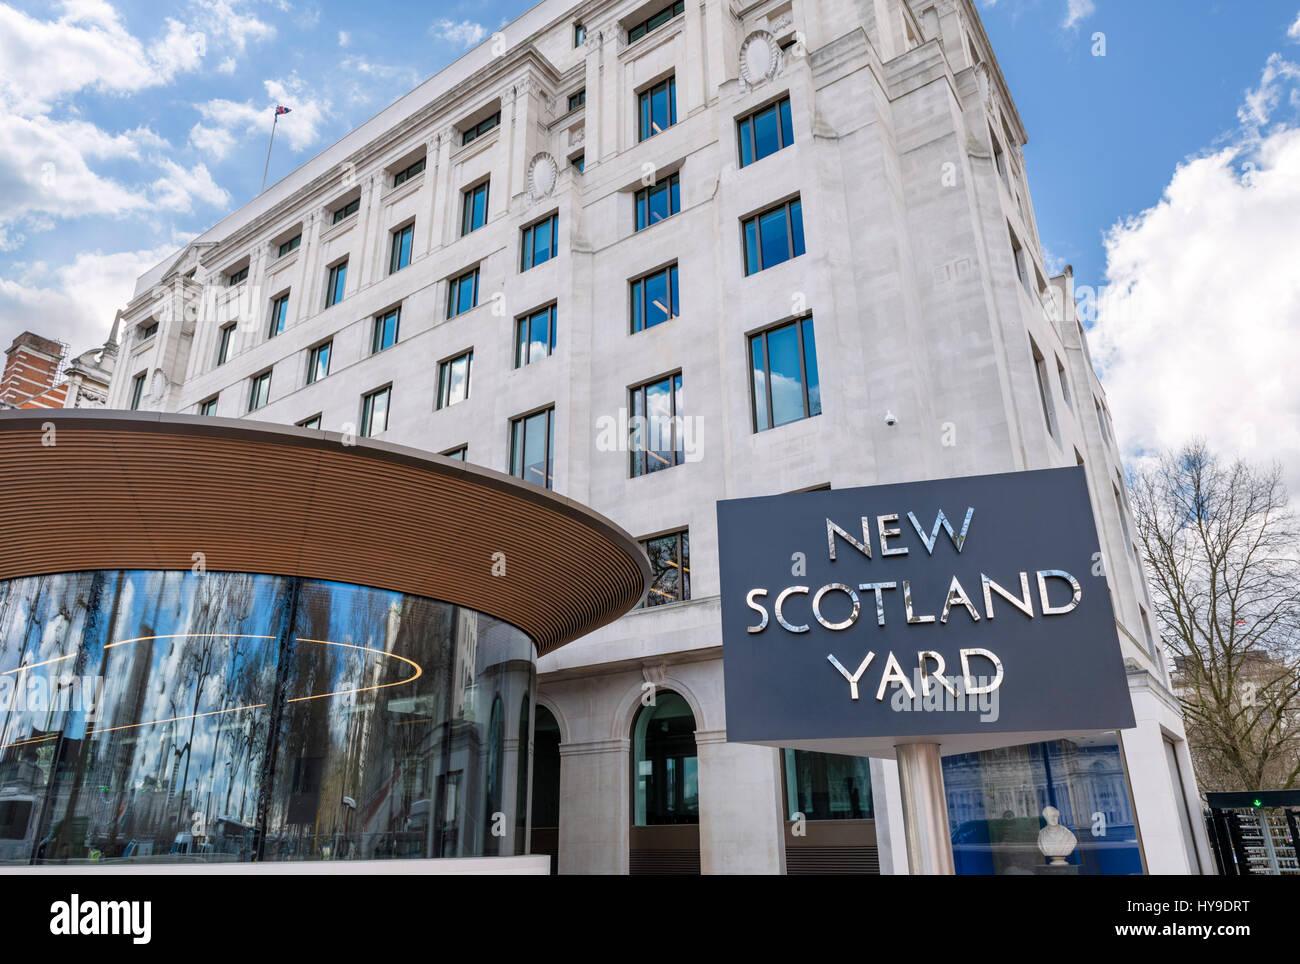 New Scotland Yard, London. Sign outside the Metropolitan Police headquarters at New Scotland Yard, Victoria Embankment, - Stock Image